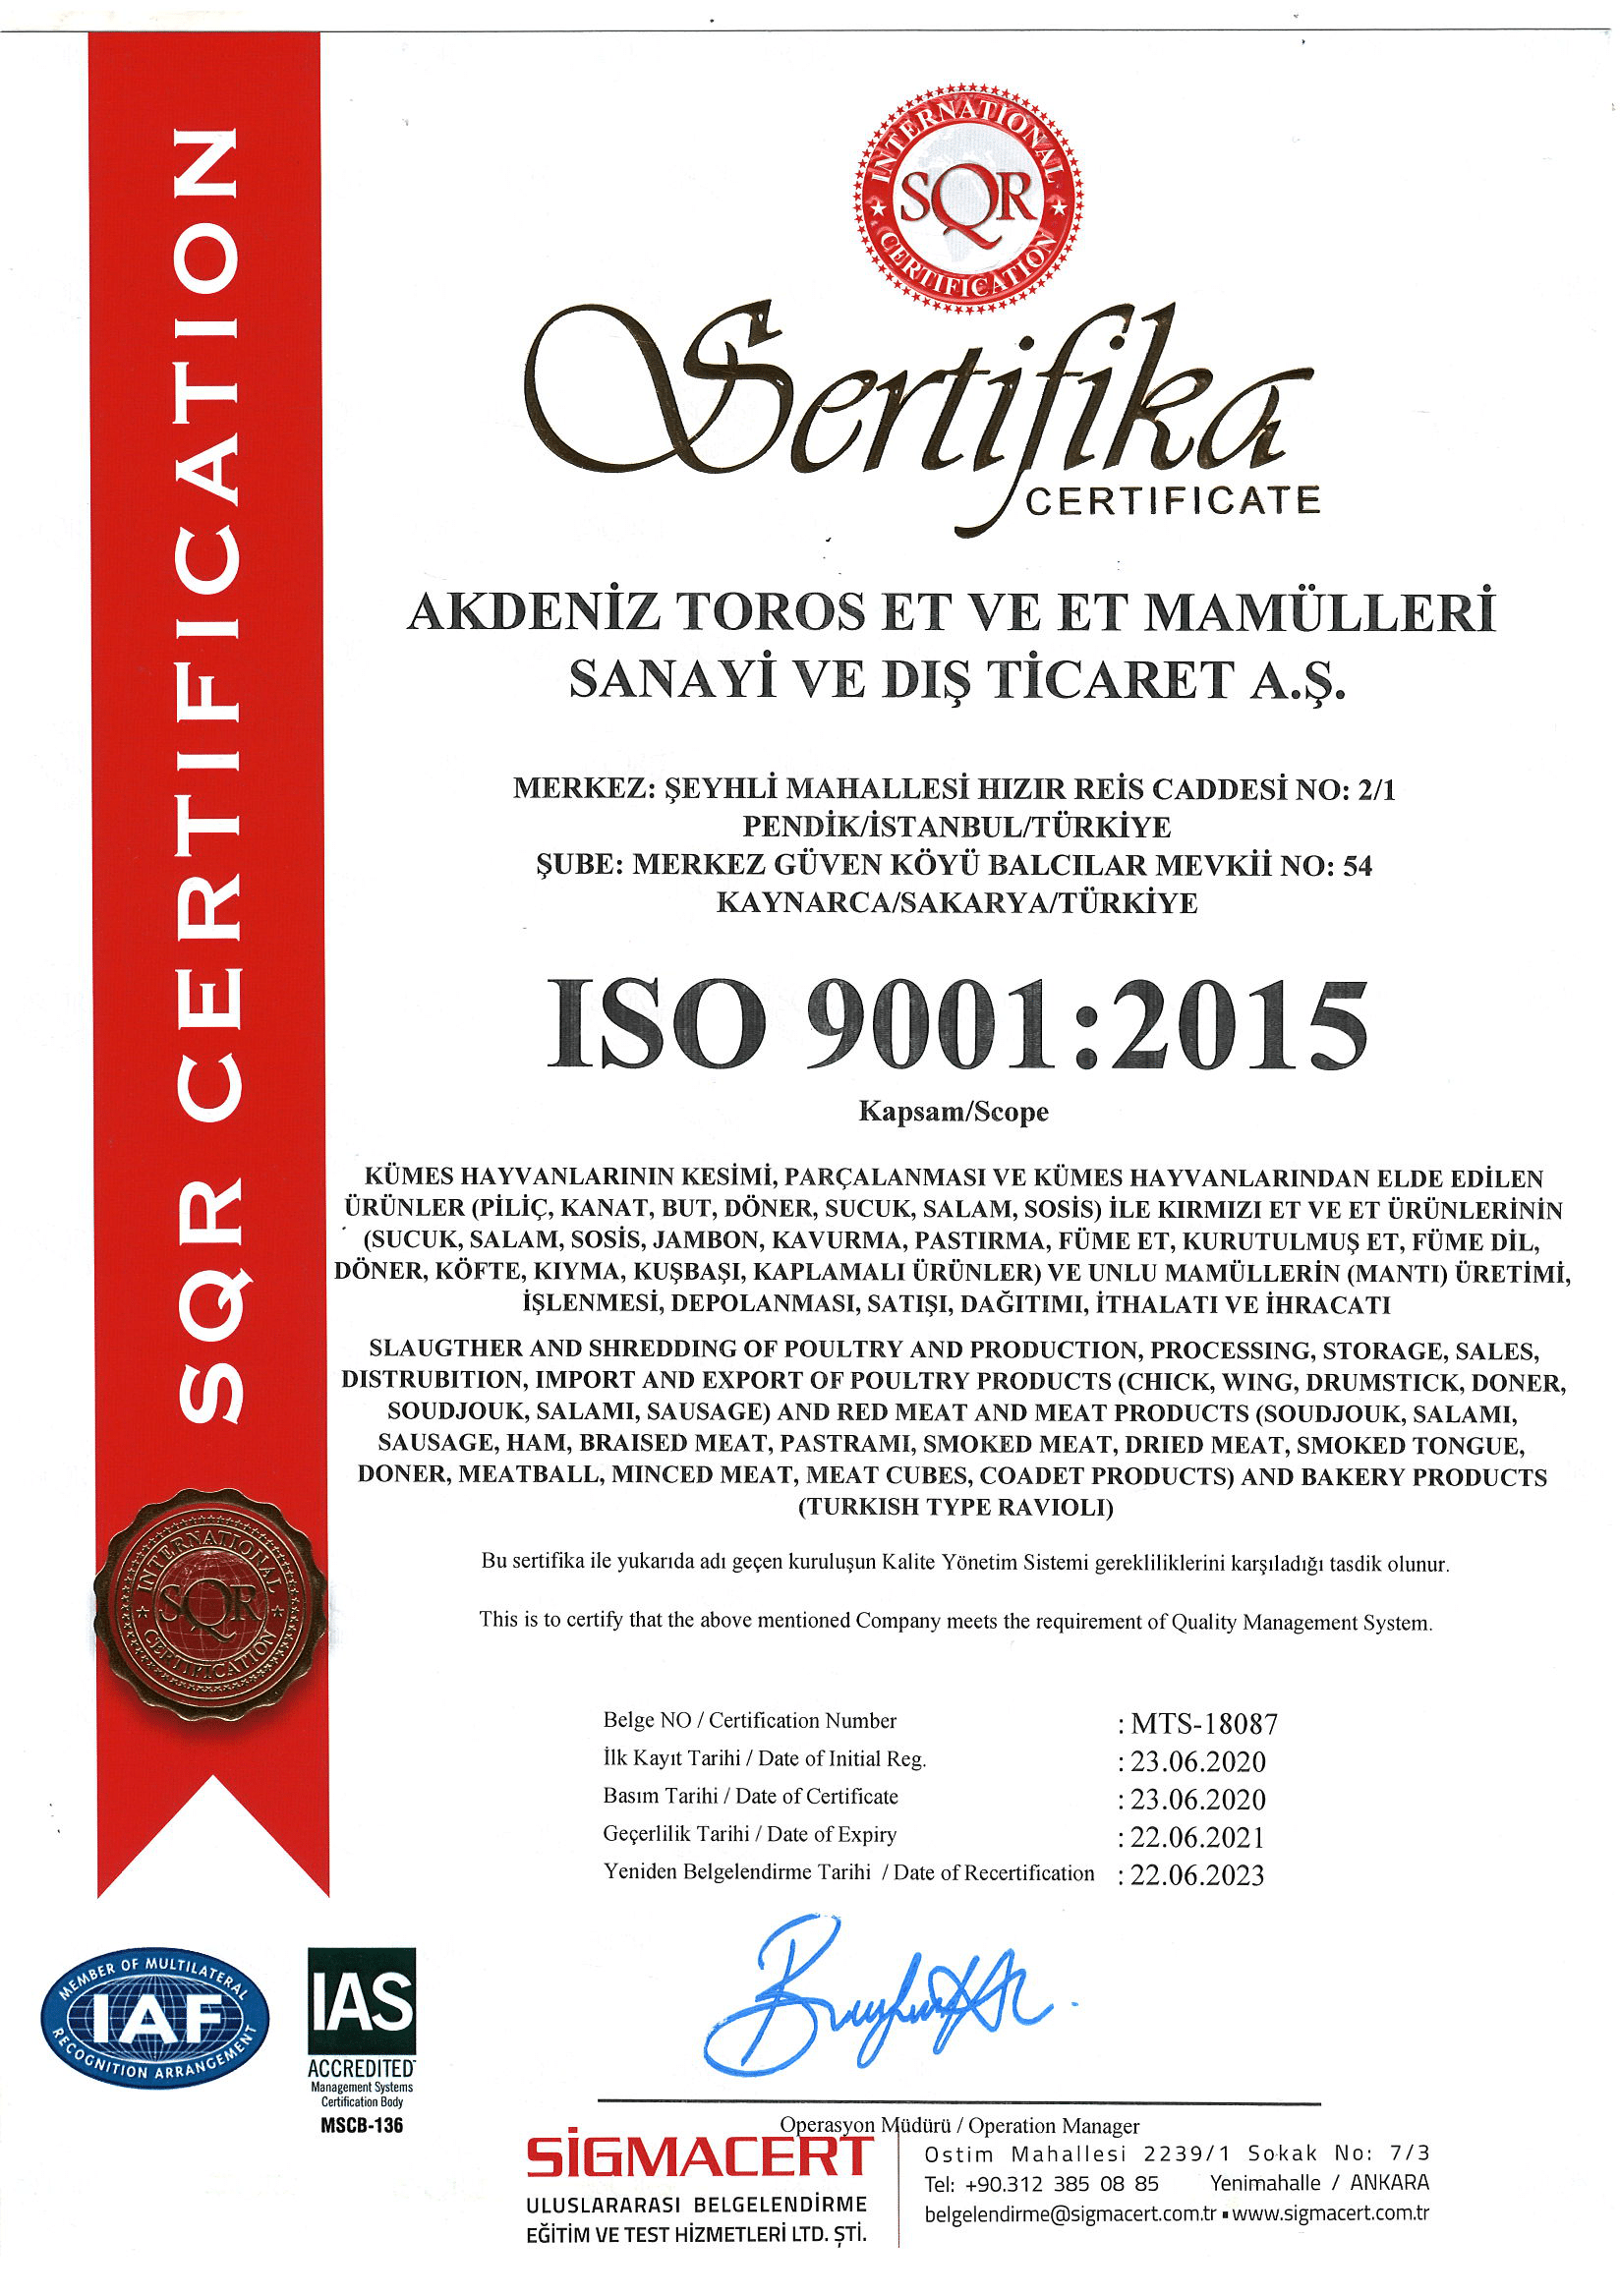 AKDENİZ TOROS ISO 9001 BELGEMİZ